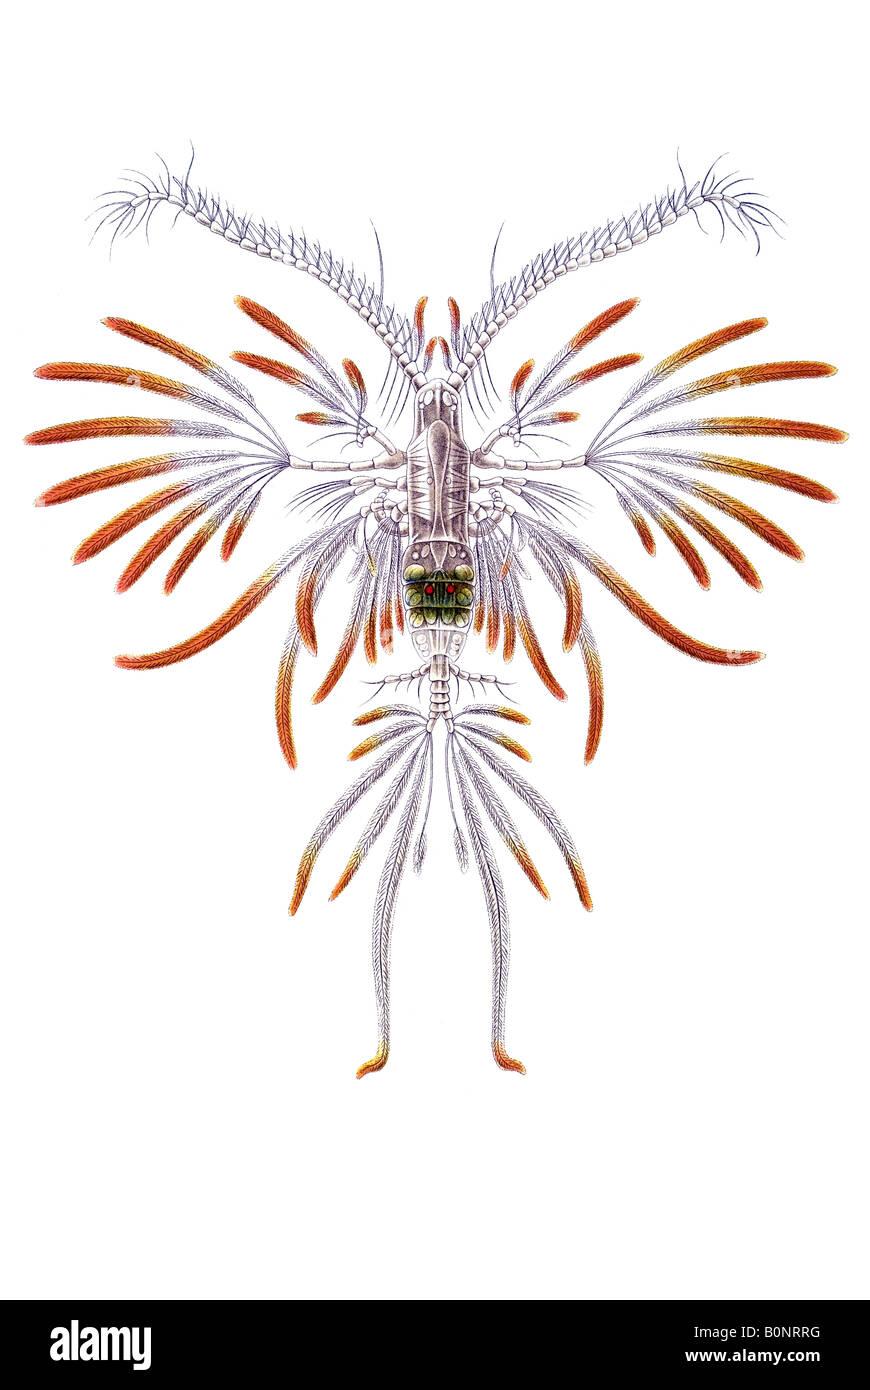 Nombre Ruderkrebse Copepoda Calanus Pavo Haeckel Kunstformen der Natur art nouveau de Europa en el siglo XX. Foto de stock